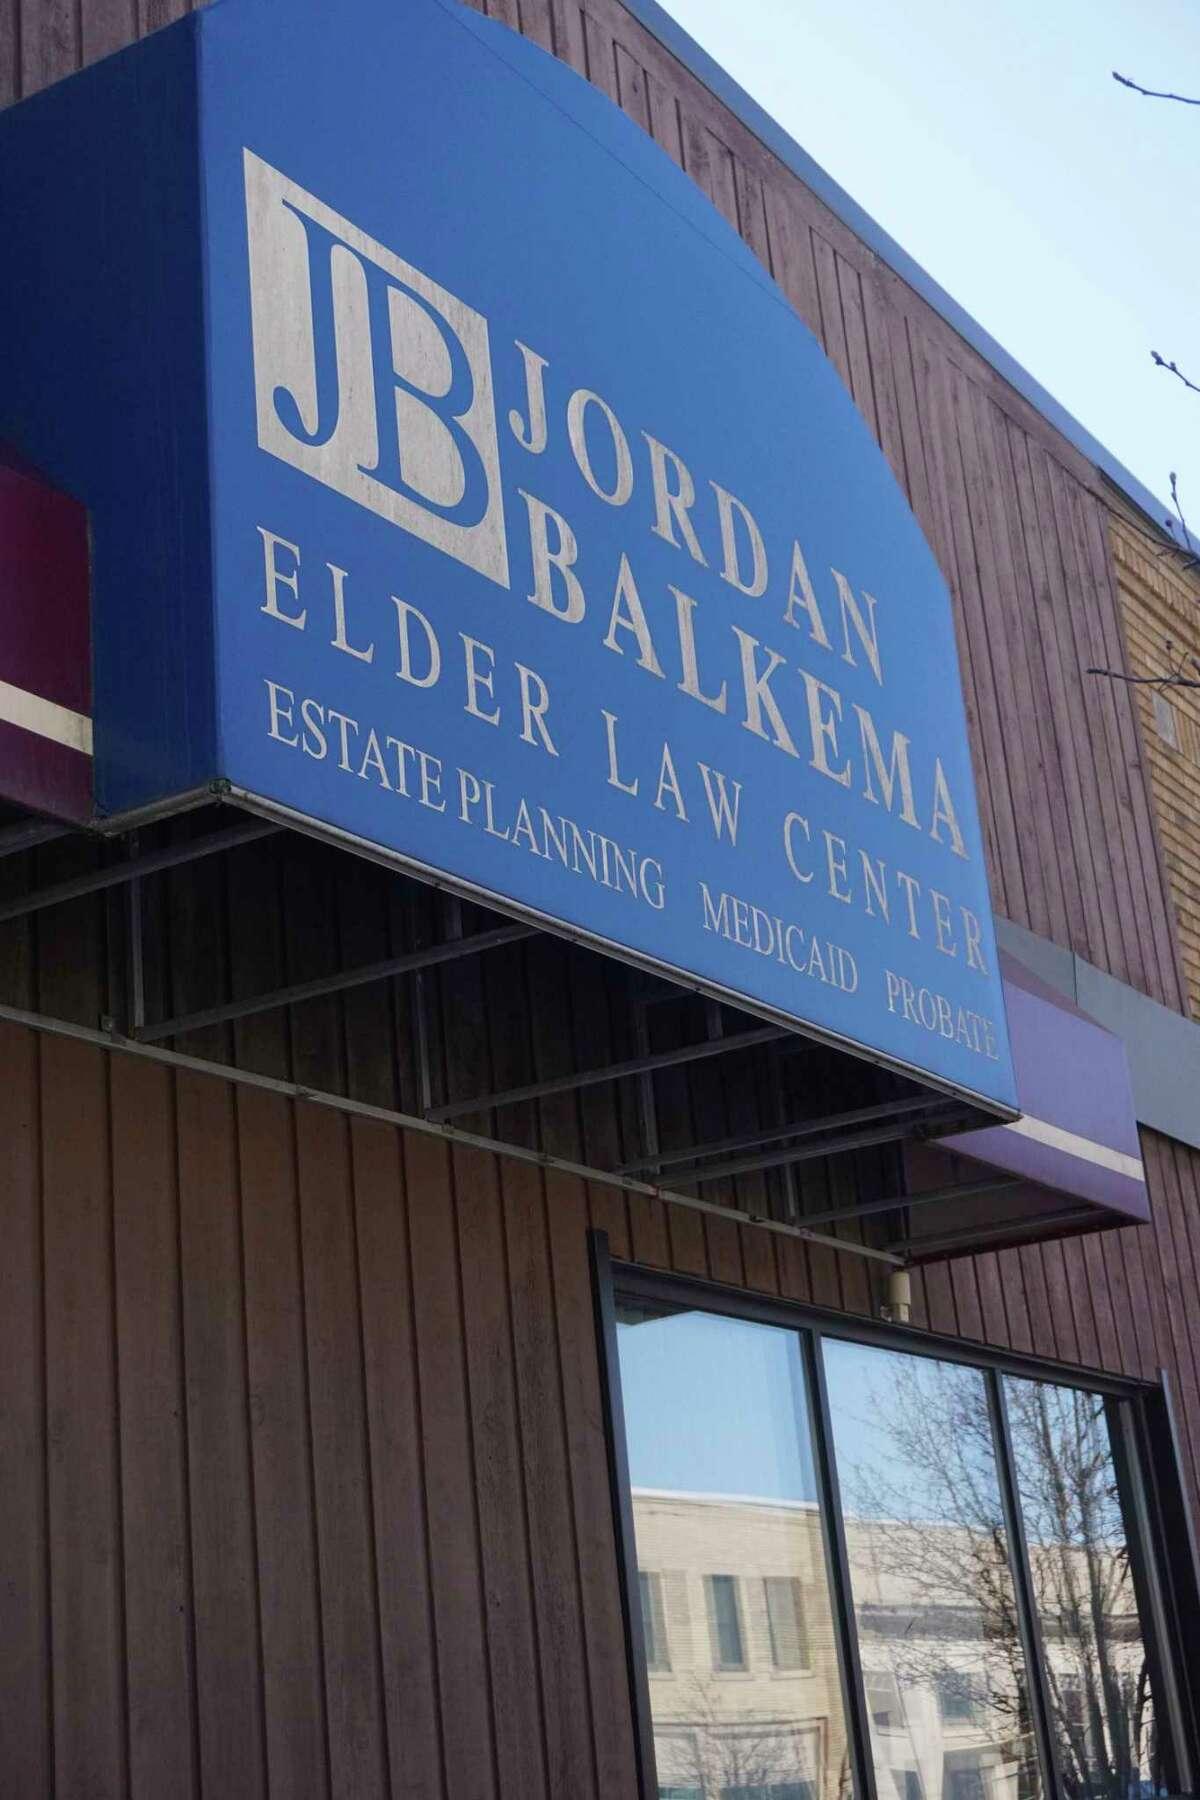 The Jordan Balkema Elder Law Center has been at its current location since 1987. (Pioneer photo/Joe Judd)